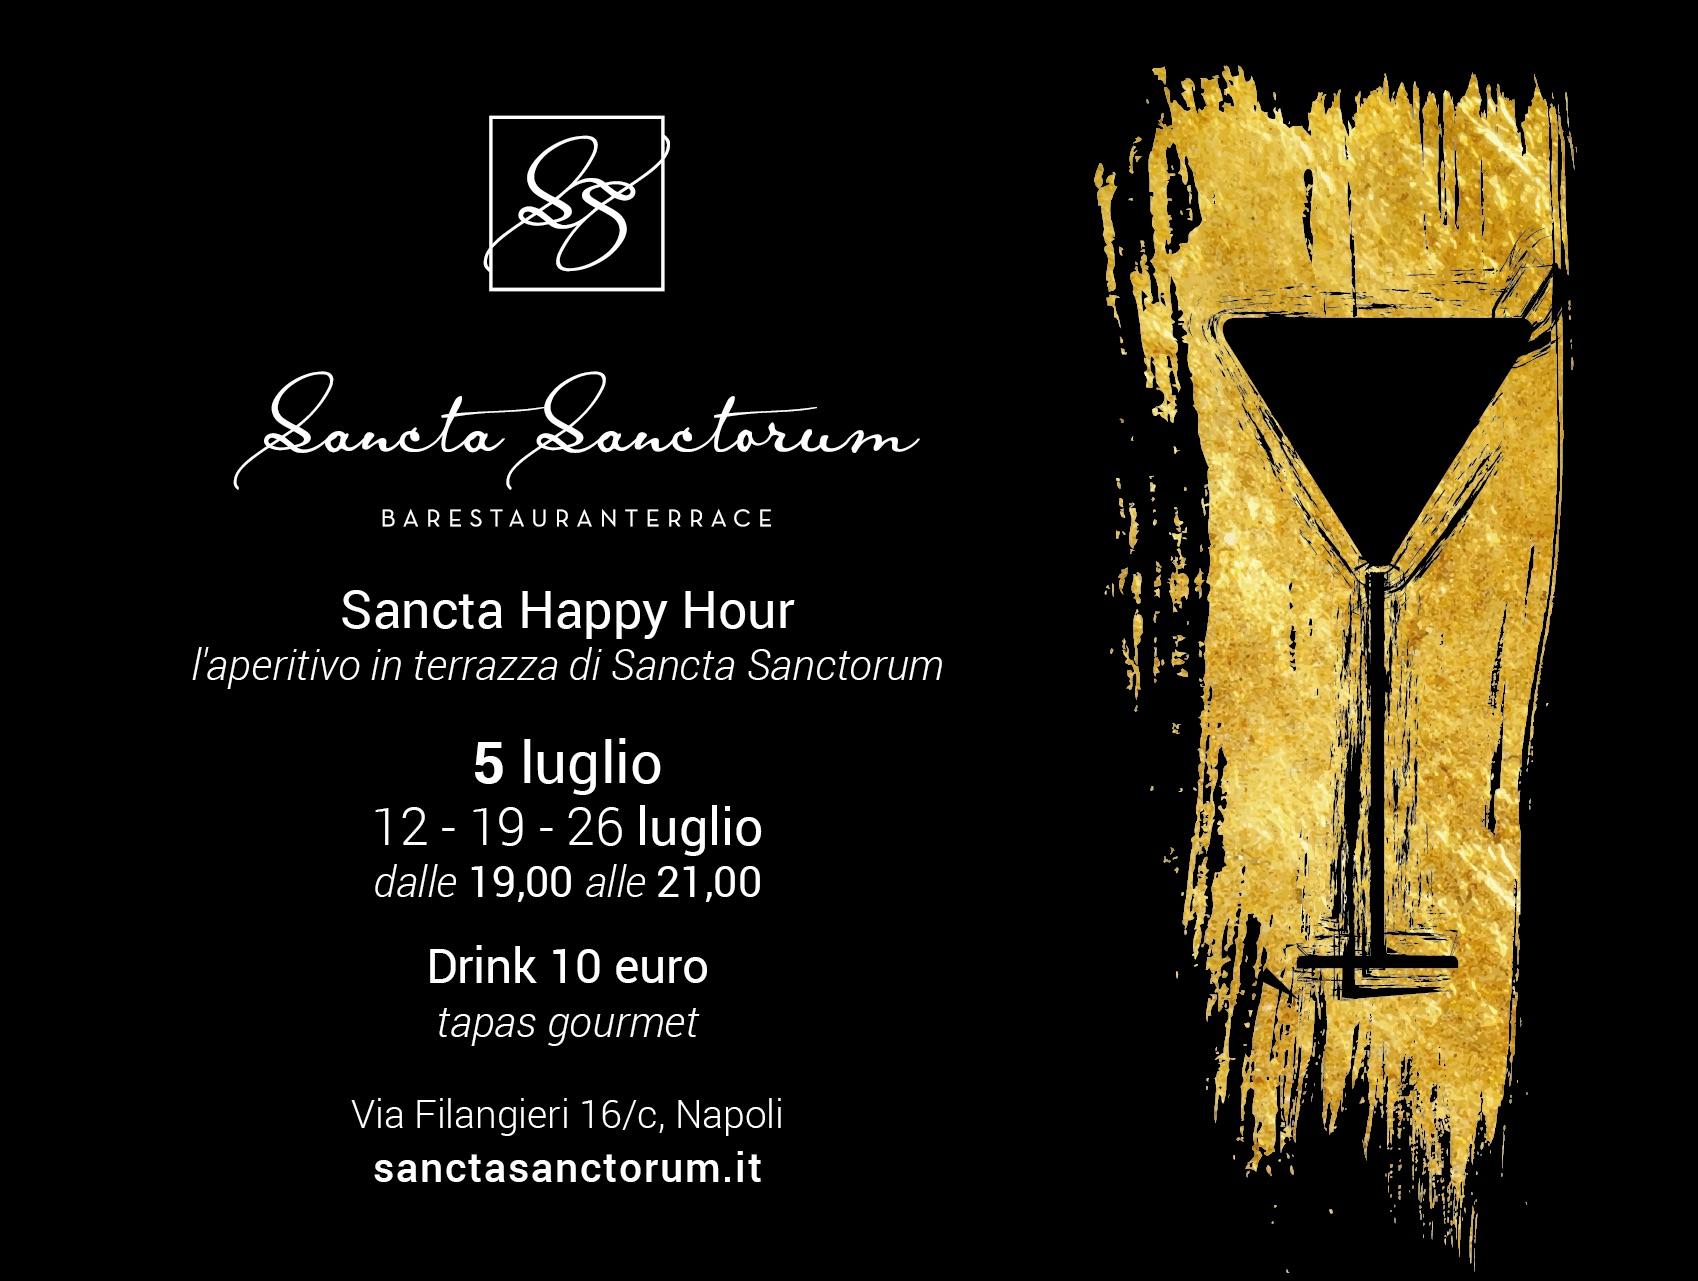 invito-sanctaok-01